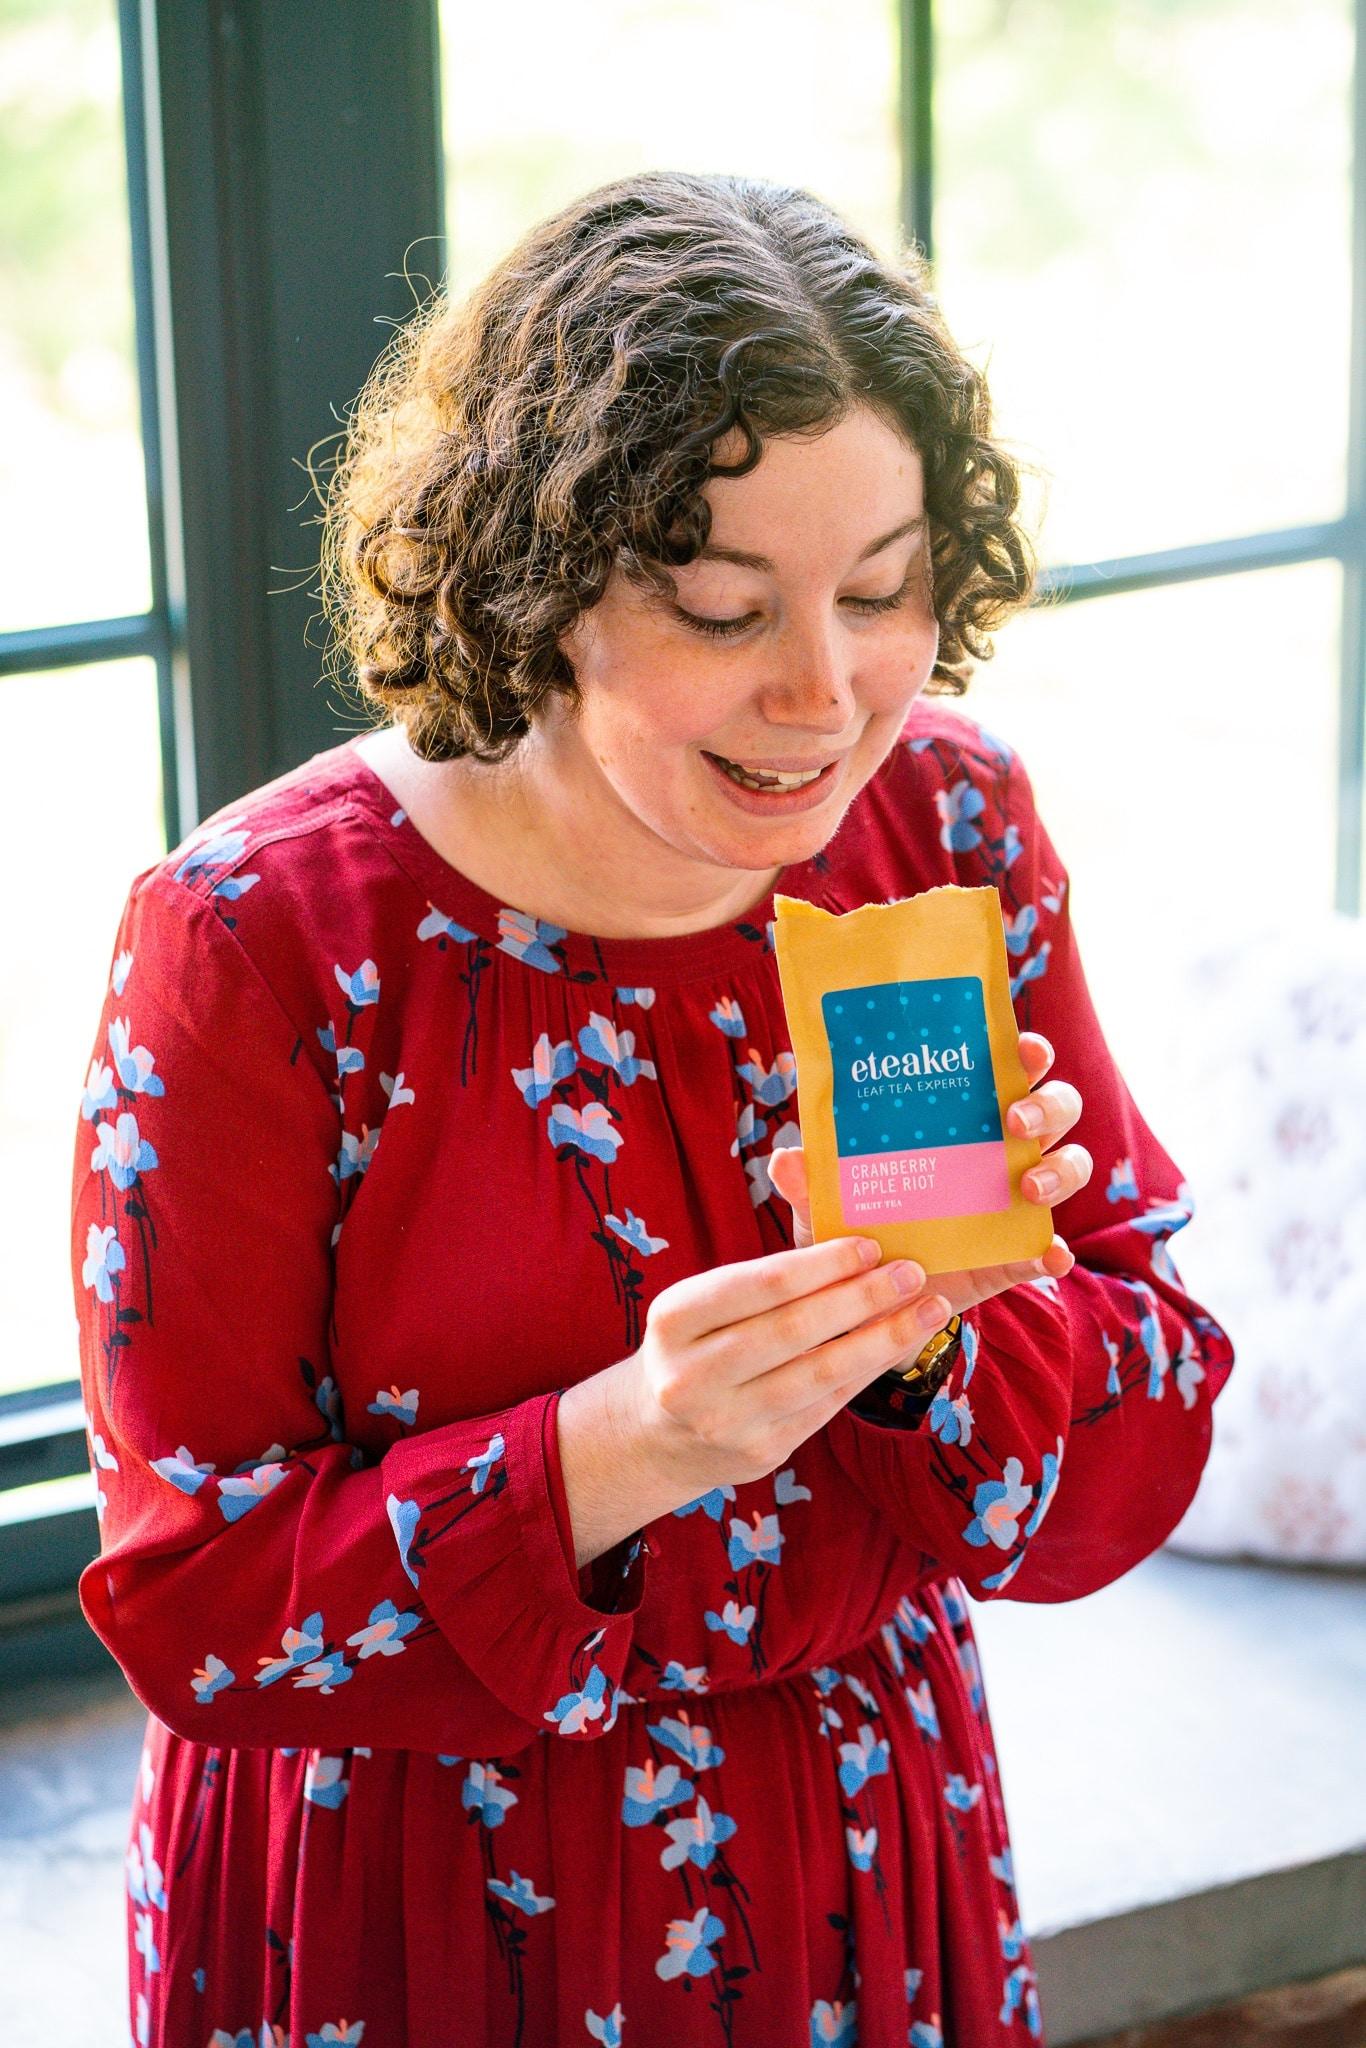 Brand ambassador eteaket Sarah